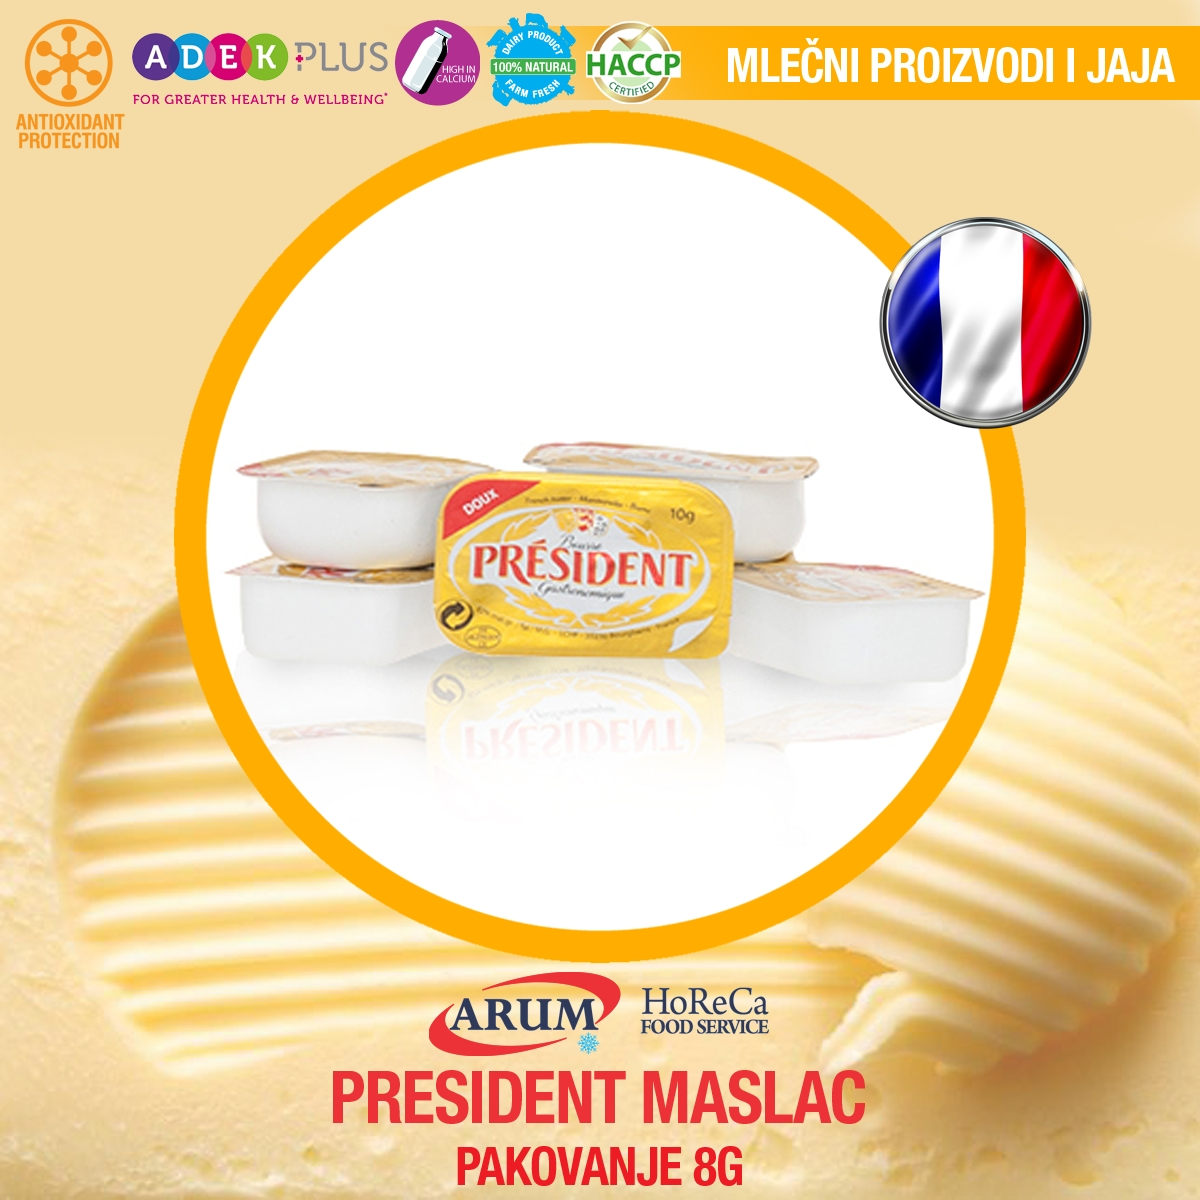 President maslac 8g